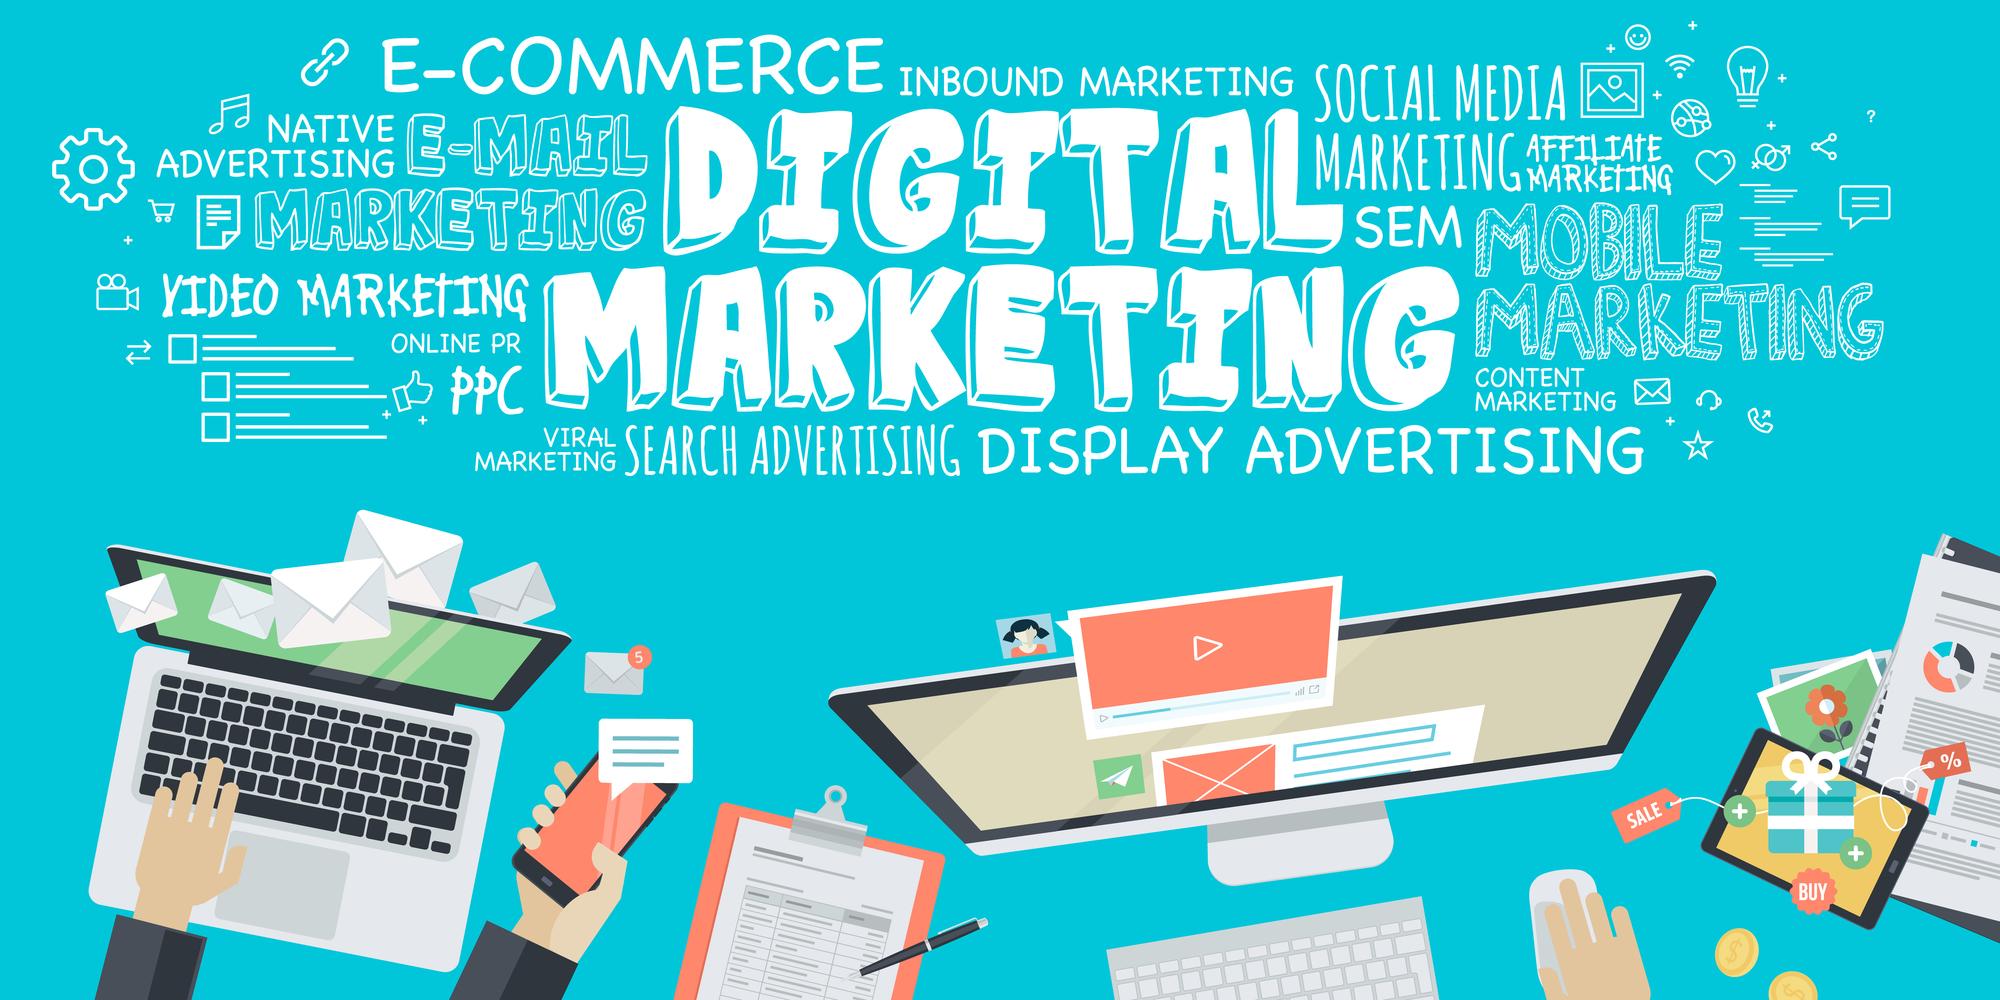 10 Reasons You Need an INTEGRATED Digital Marketing and Social Media Plan